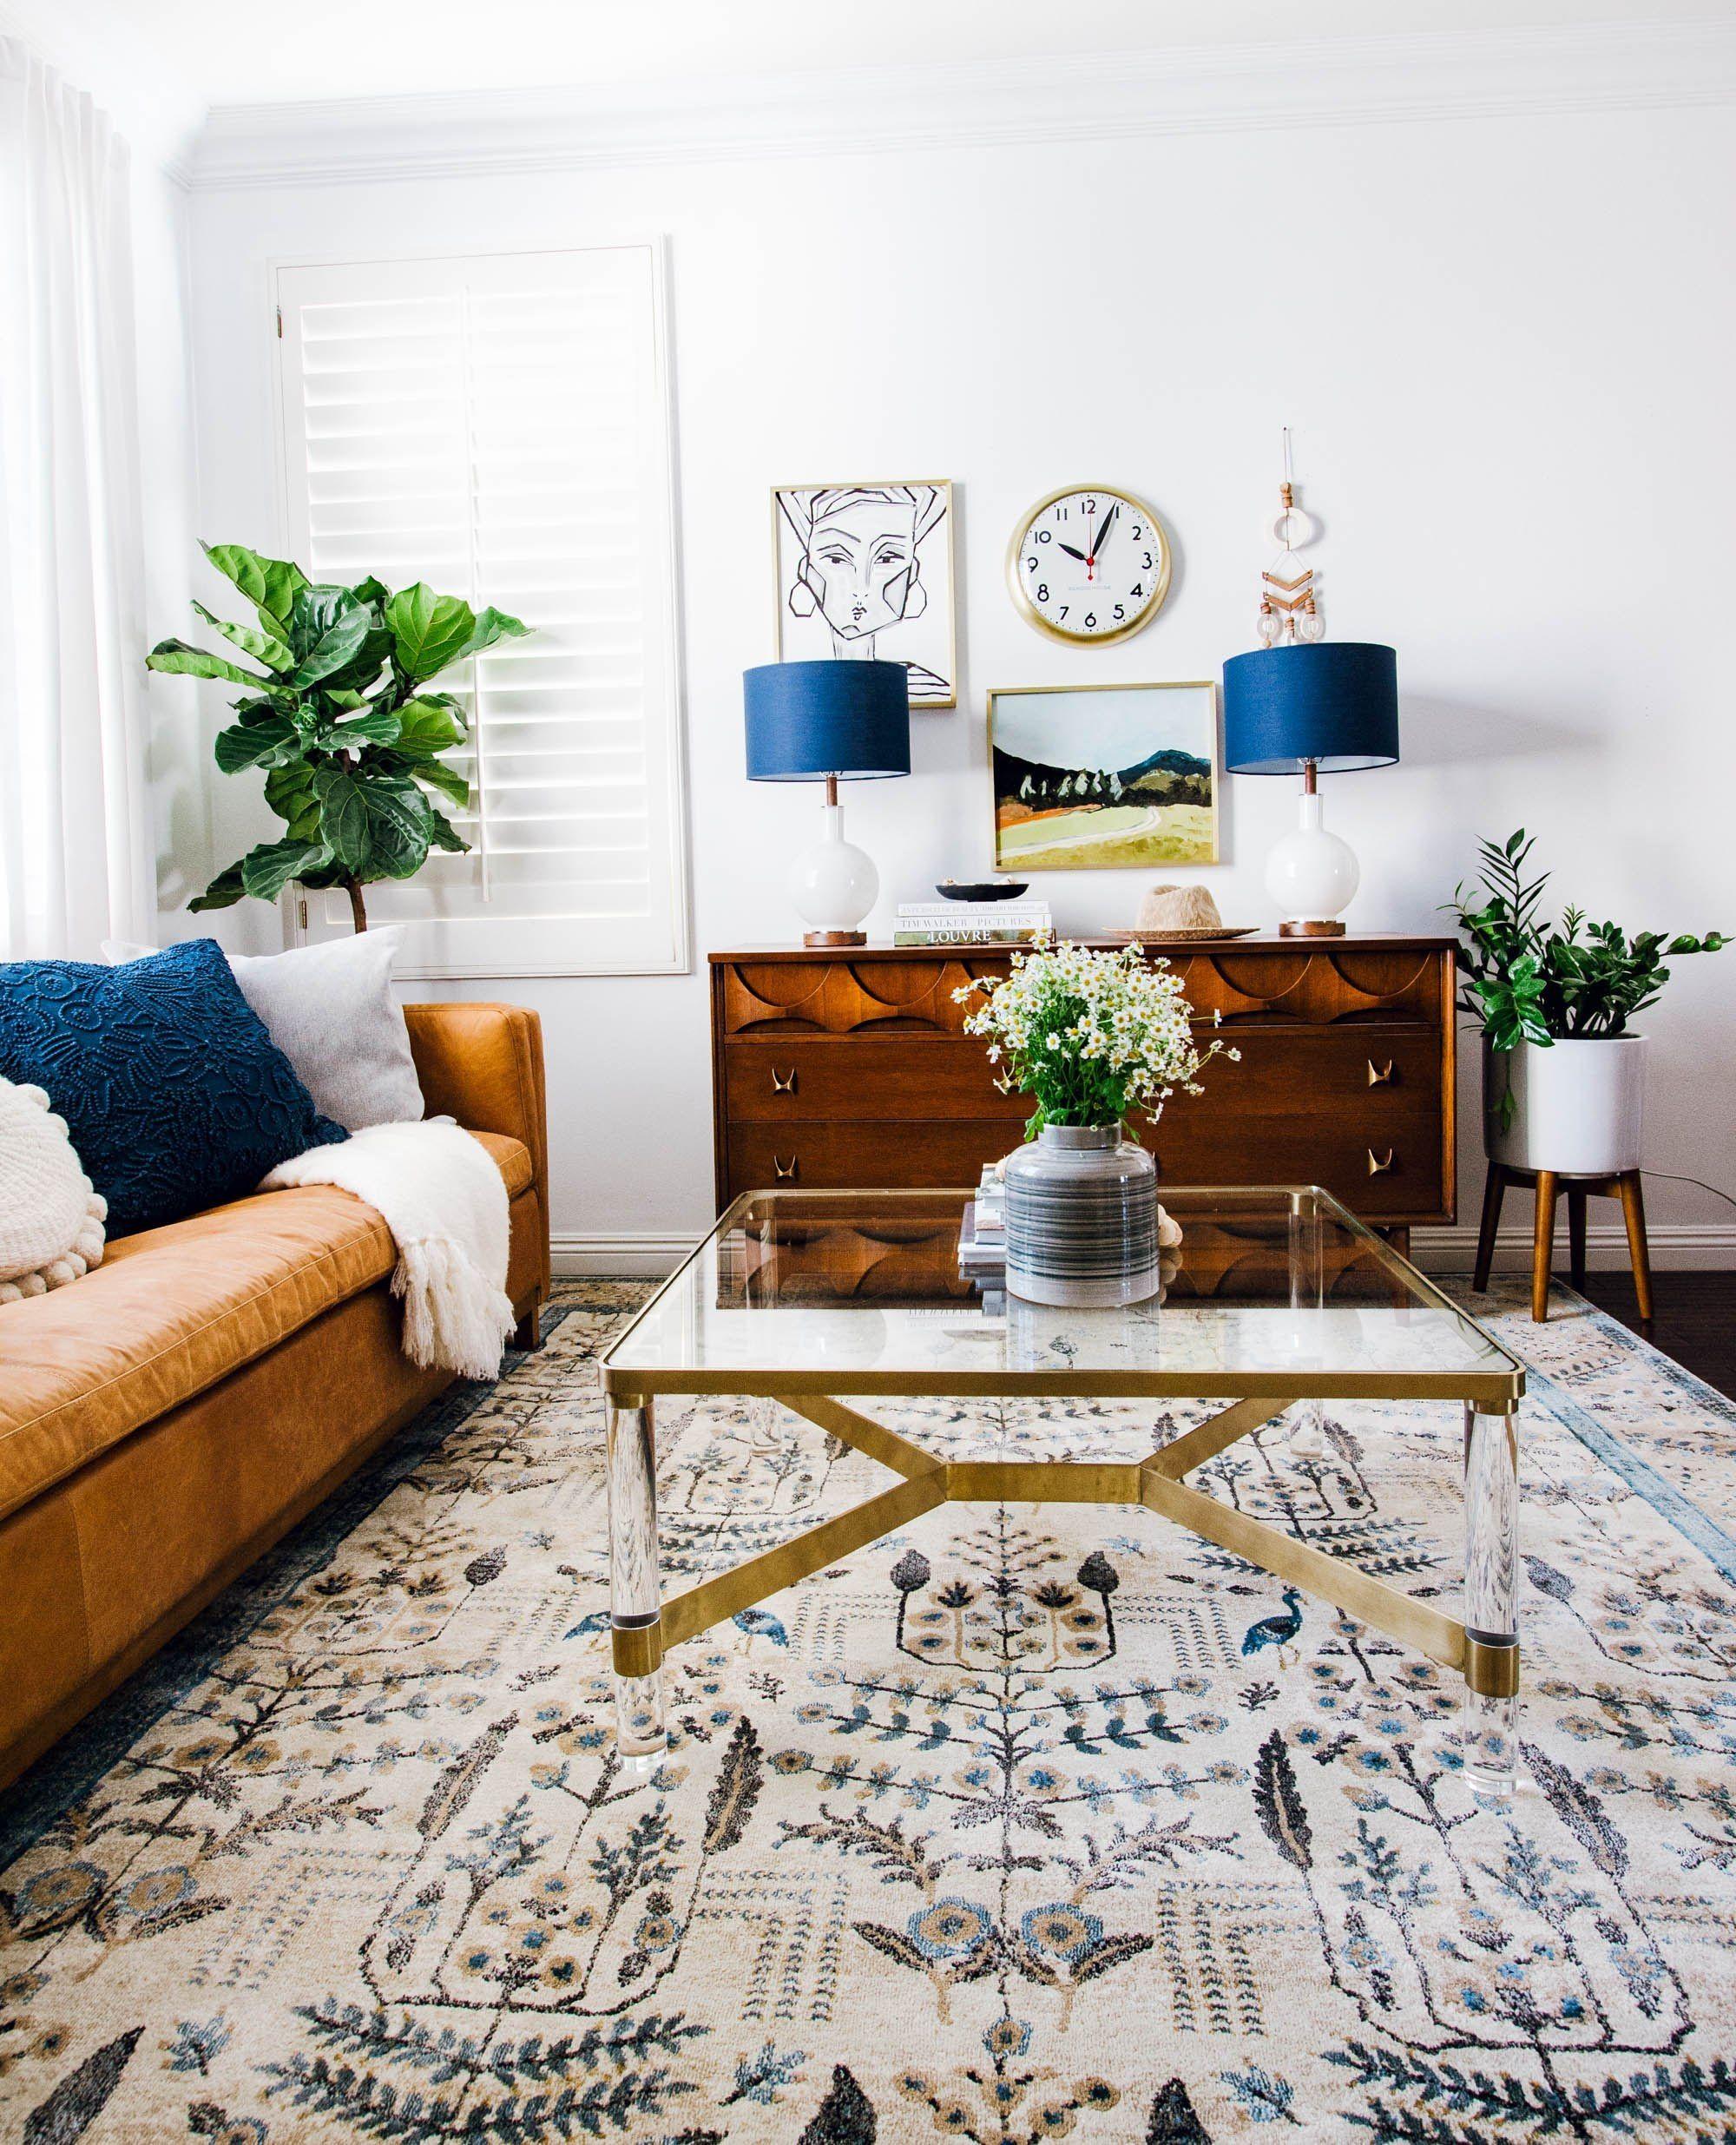 Modern Credenza Anita Yokota Vintage Modern Living Room Mid Century Modern Living Room Design Mid Century Modern Living Room